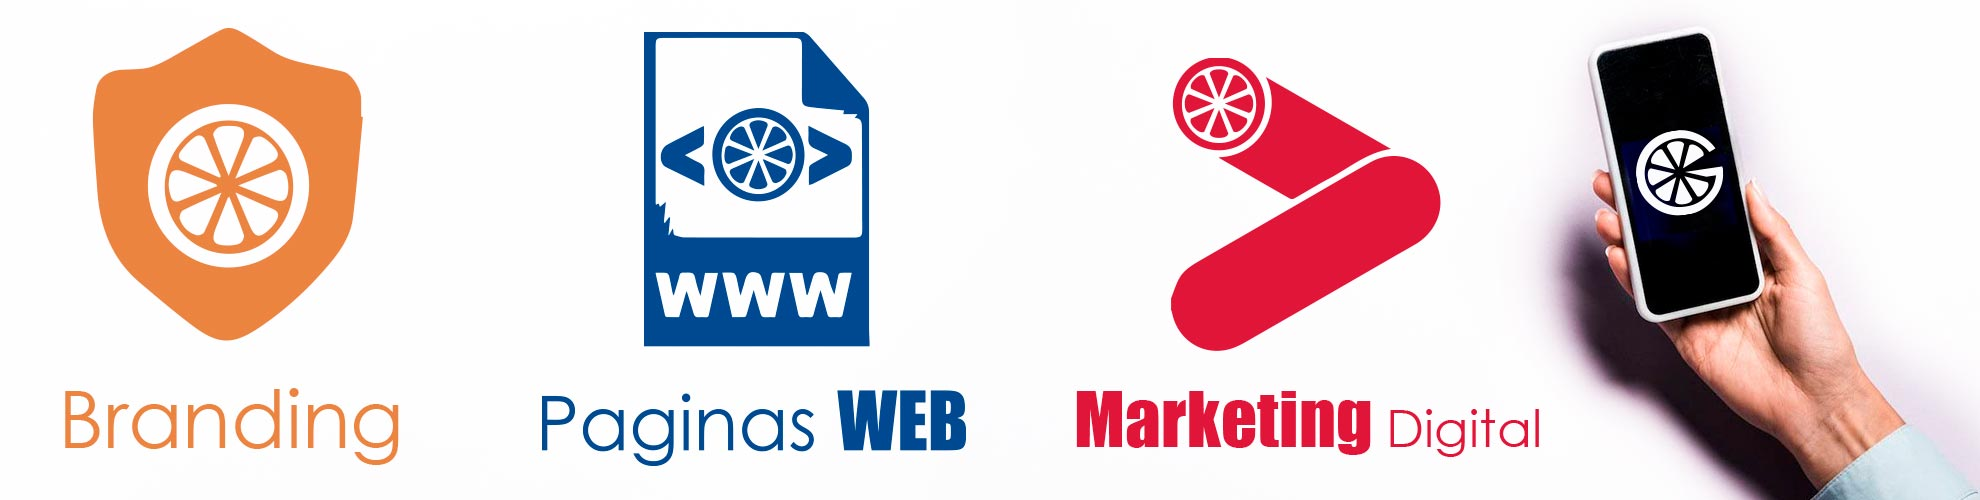 Gimmick Servicios Agencia Marketing